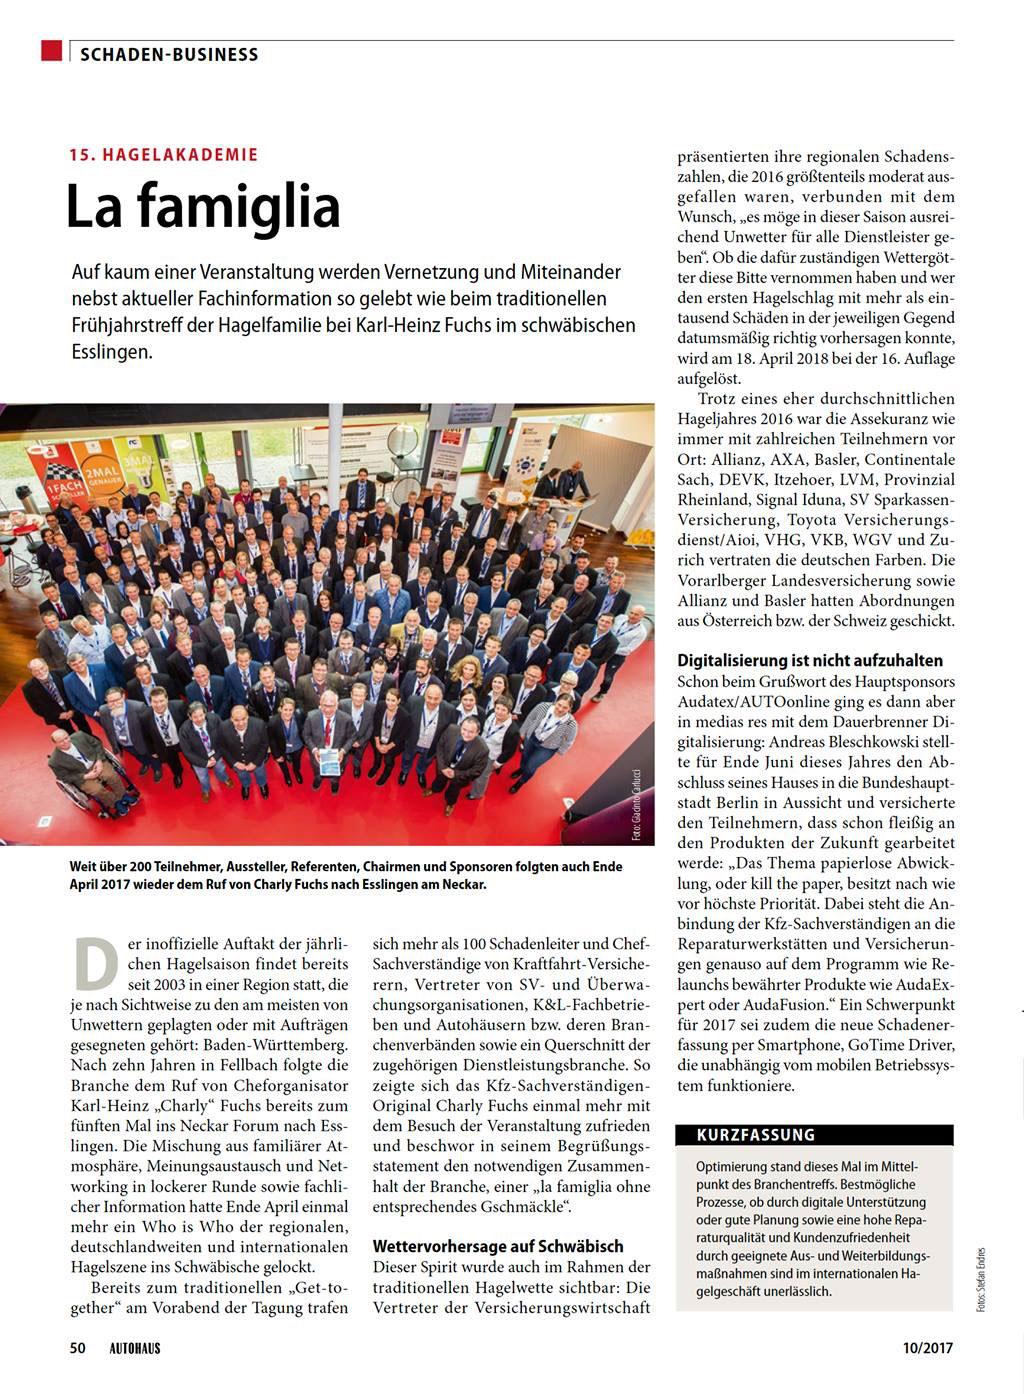 hsz-news-hagel-akademie-esslingen-bericht-autohaus-magazin-2017-01